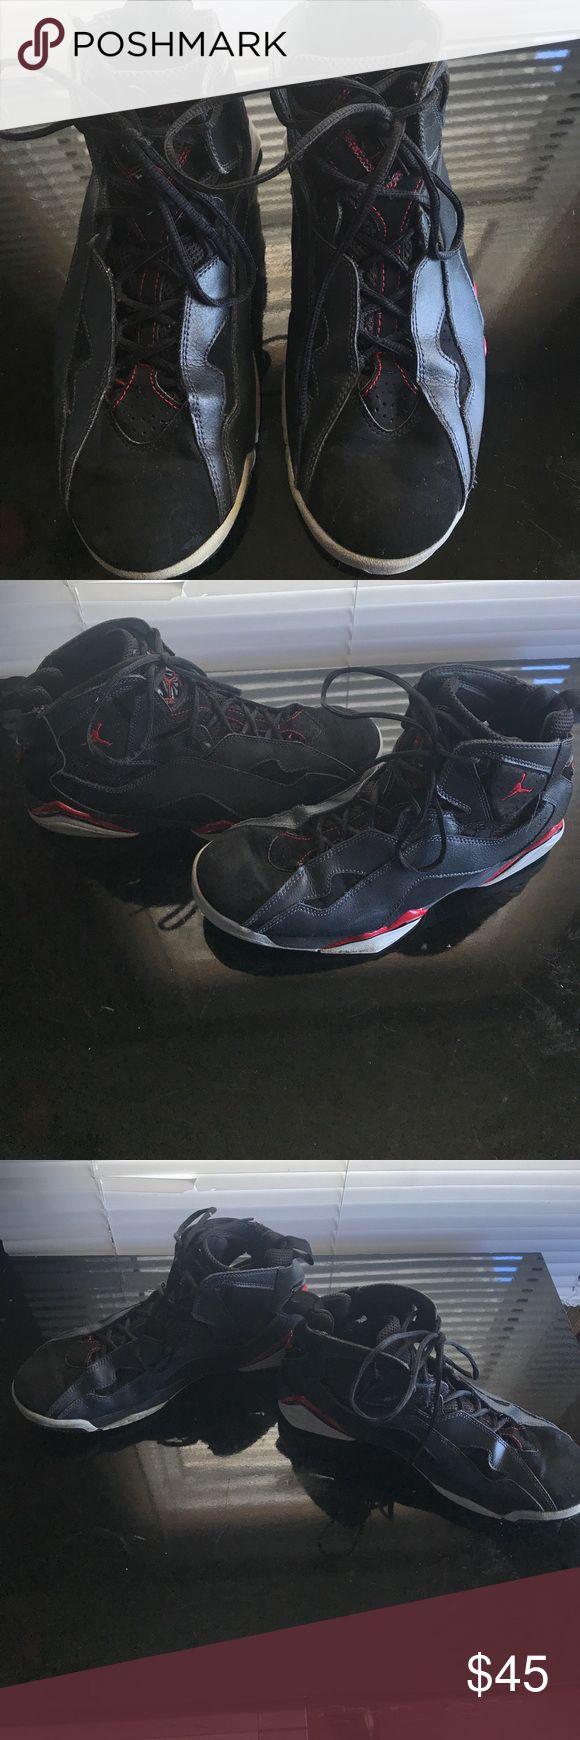 Nike Air Jordan True Flight Black/Red Preowned Nike Air Jordans!! Size 10🏀🏀🏀🏀 You will ❤️ them! nike air jordan Shoes Sneakers